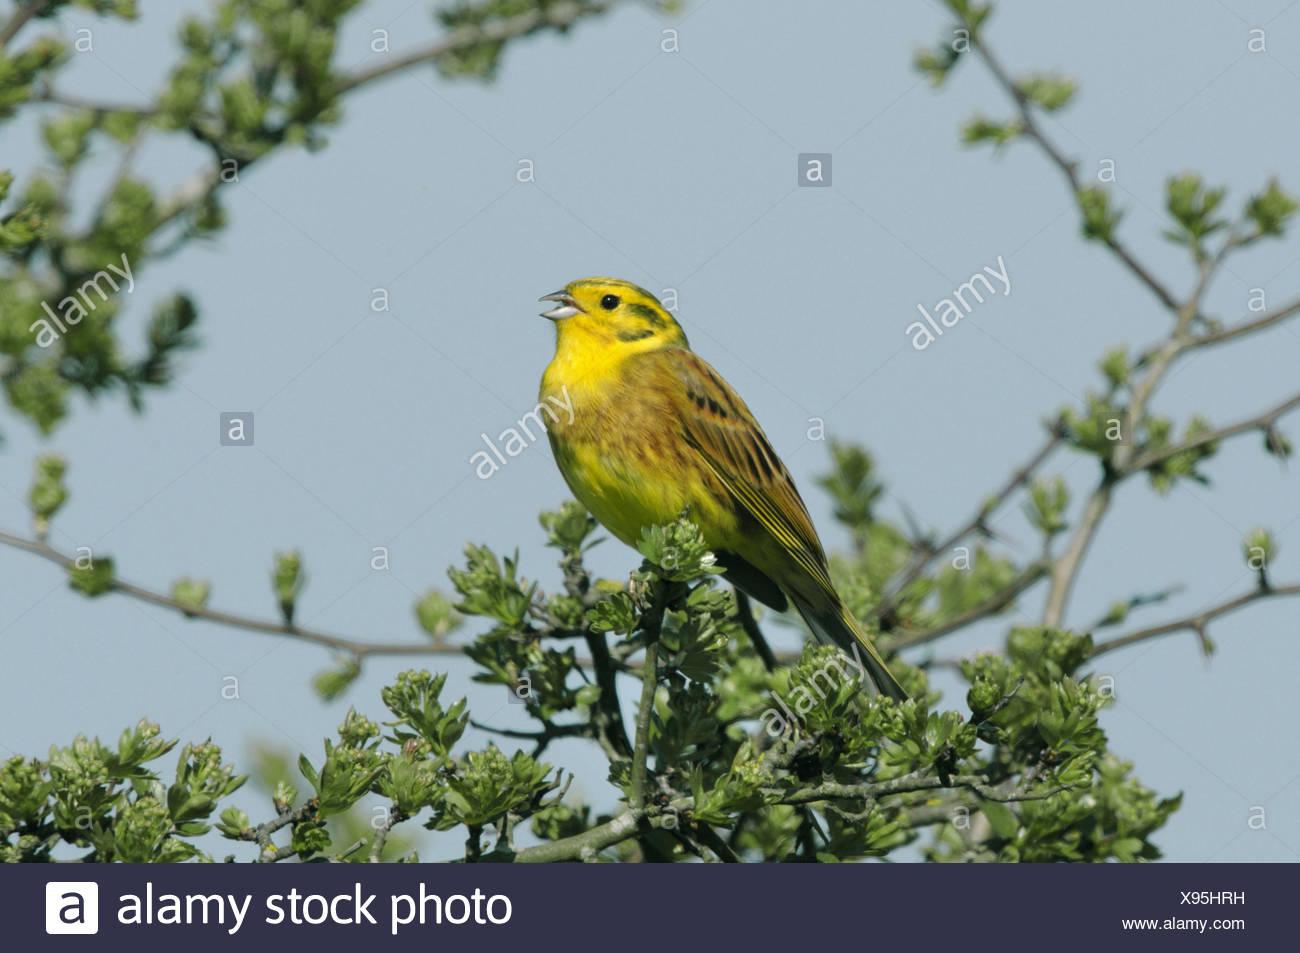 Yellowhammer Emberiza citrinella - Stock Image